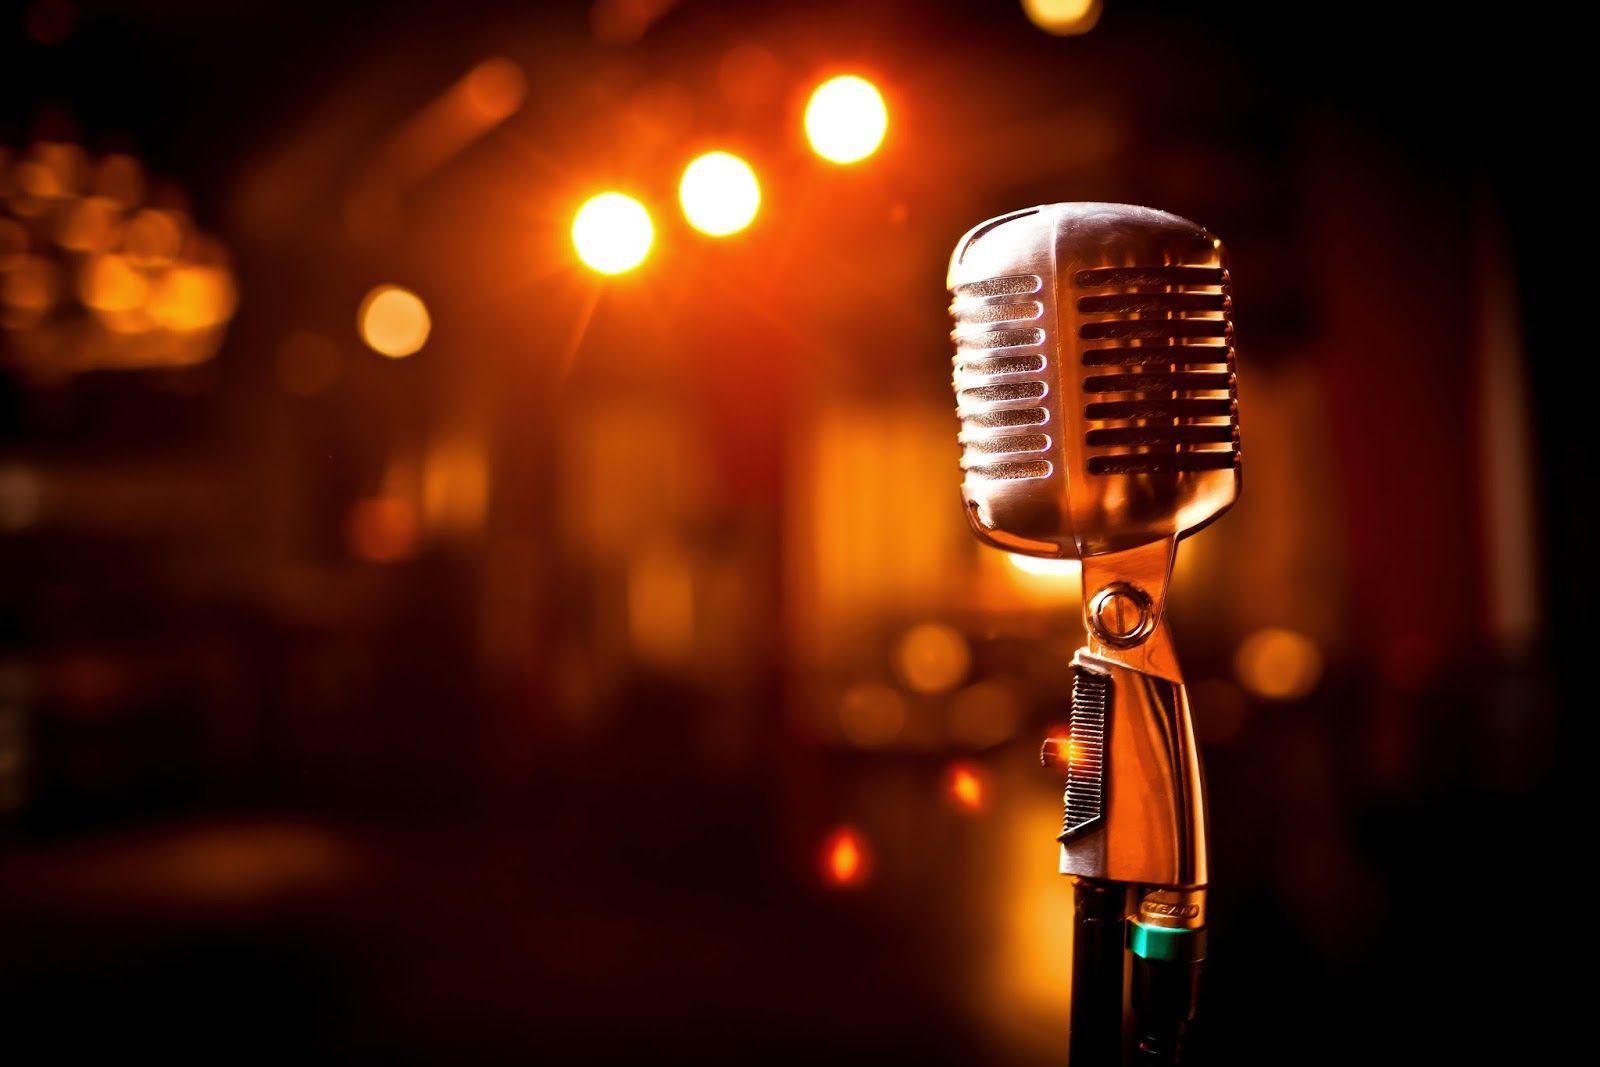 Microfono Vintage Hilda Rock The Band Pinterest School